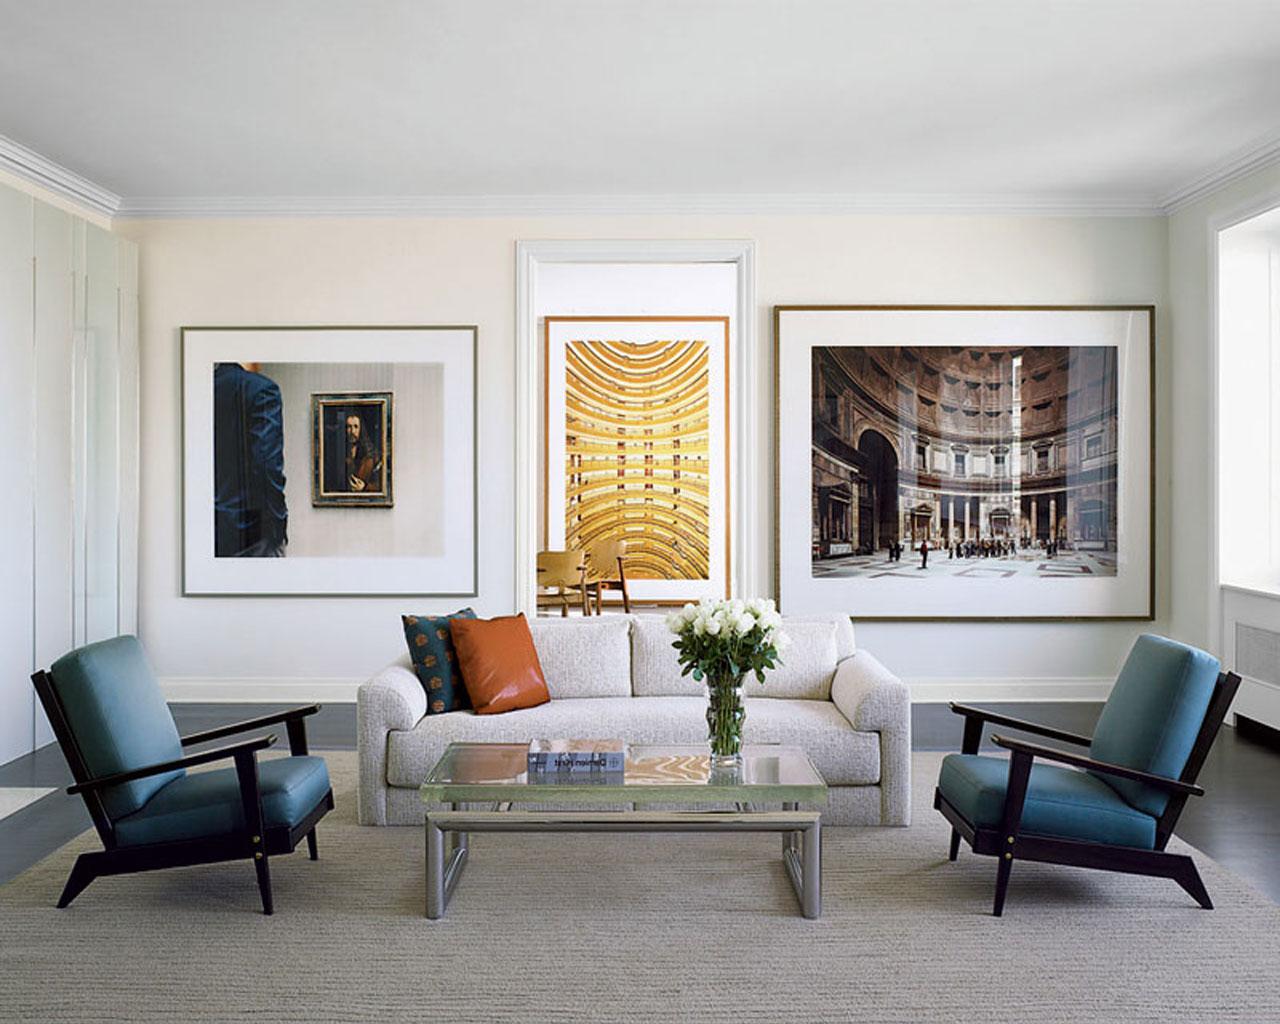 Interiors And Fine Art